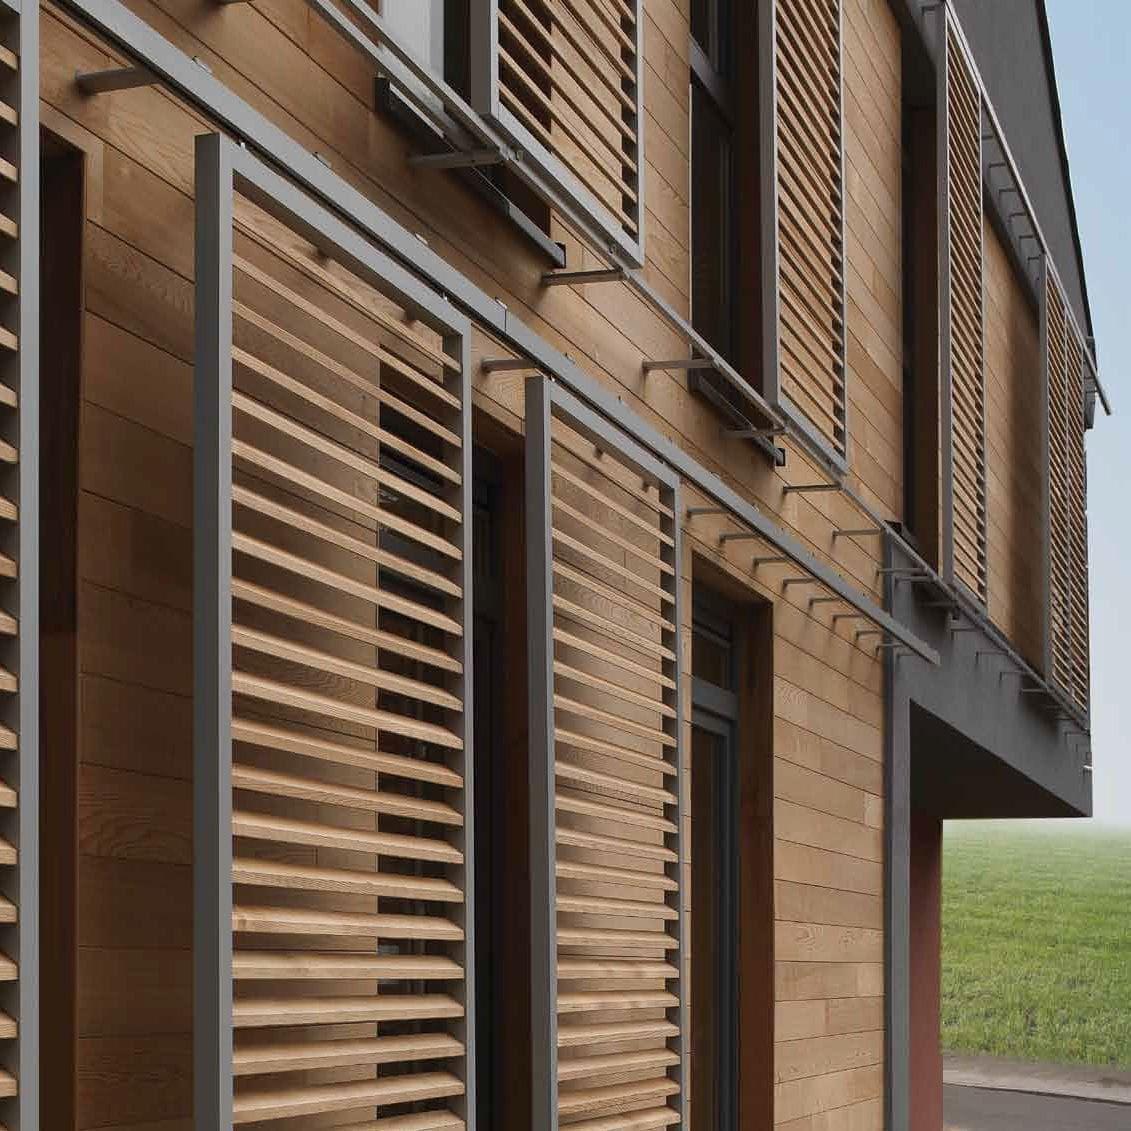 Celos a con lamas deslizante de aluminio de madera for Puertas prefabricadas